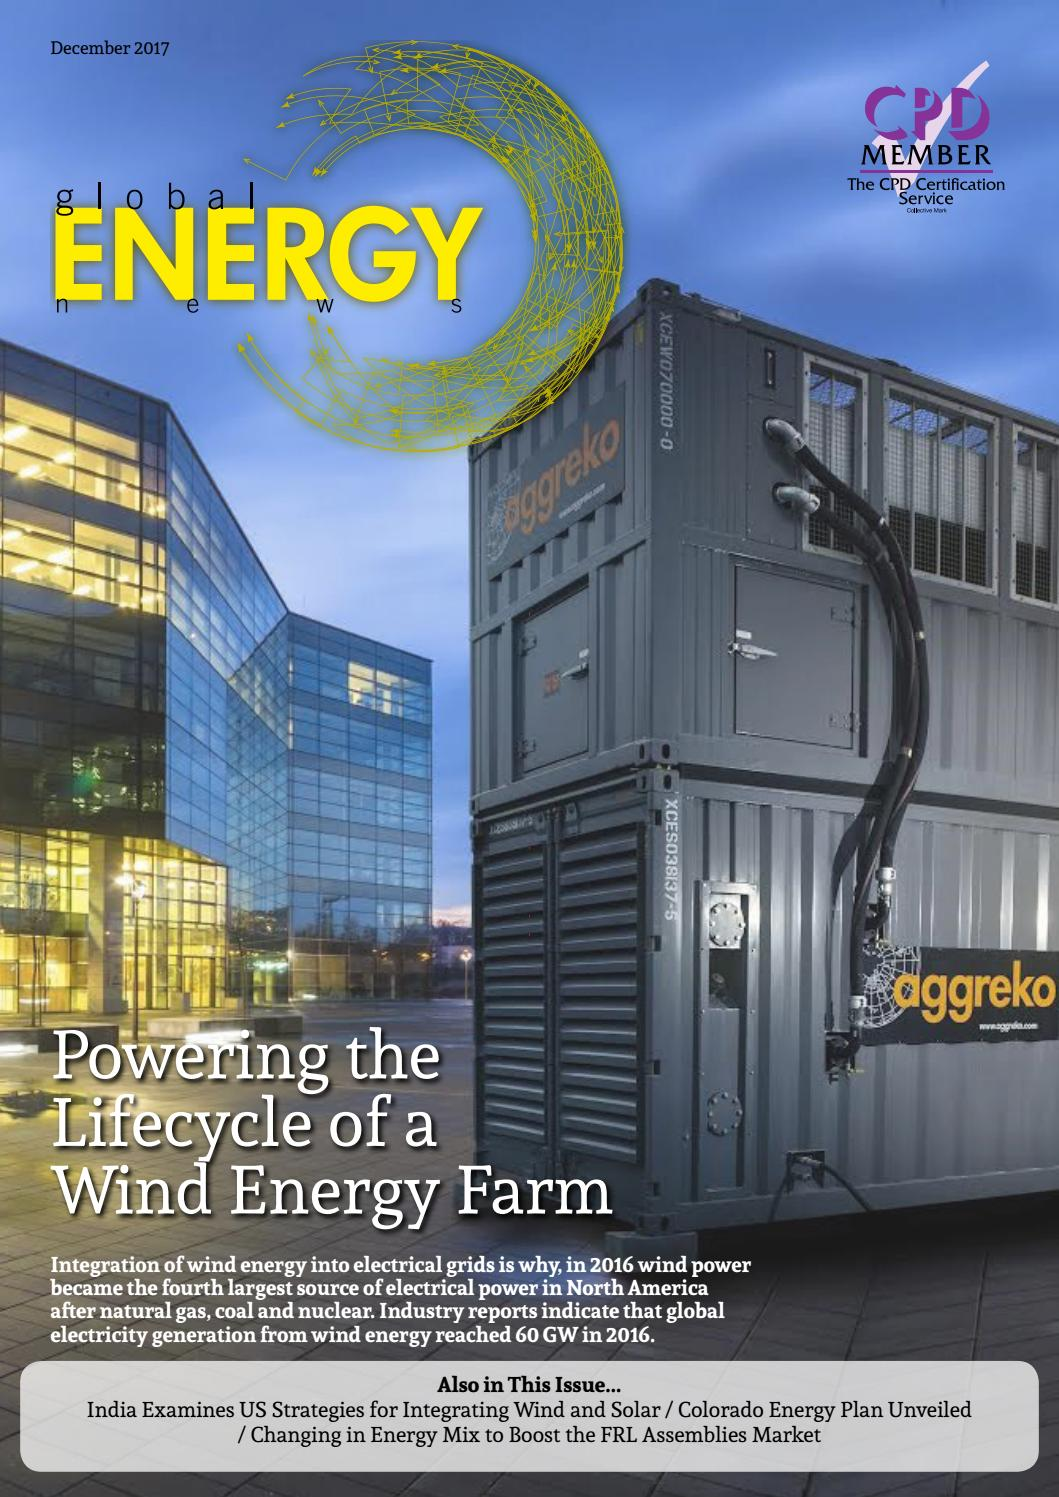 Global Energy News December 2017 Aggreko By Ai Media Issuu Towers Great Rock Windpower